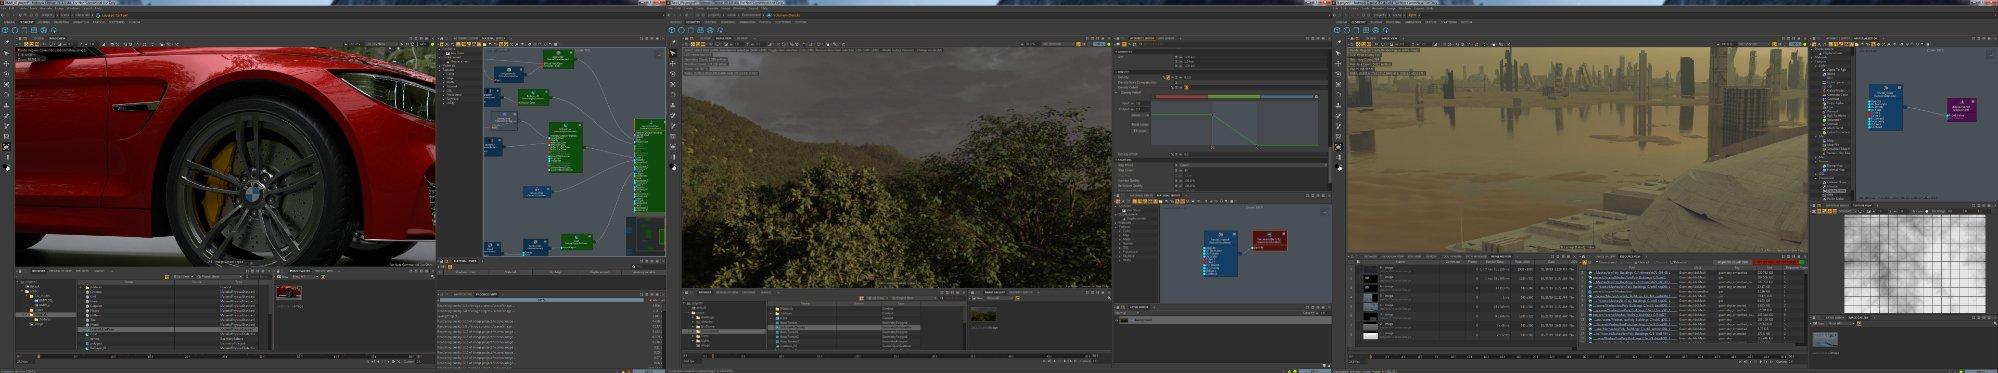 Isotropix Clarisse v 4 Course | Proteus VFX School